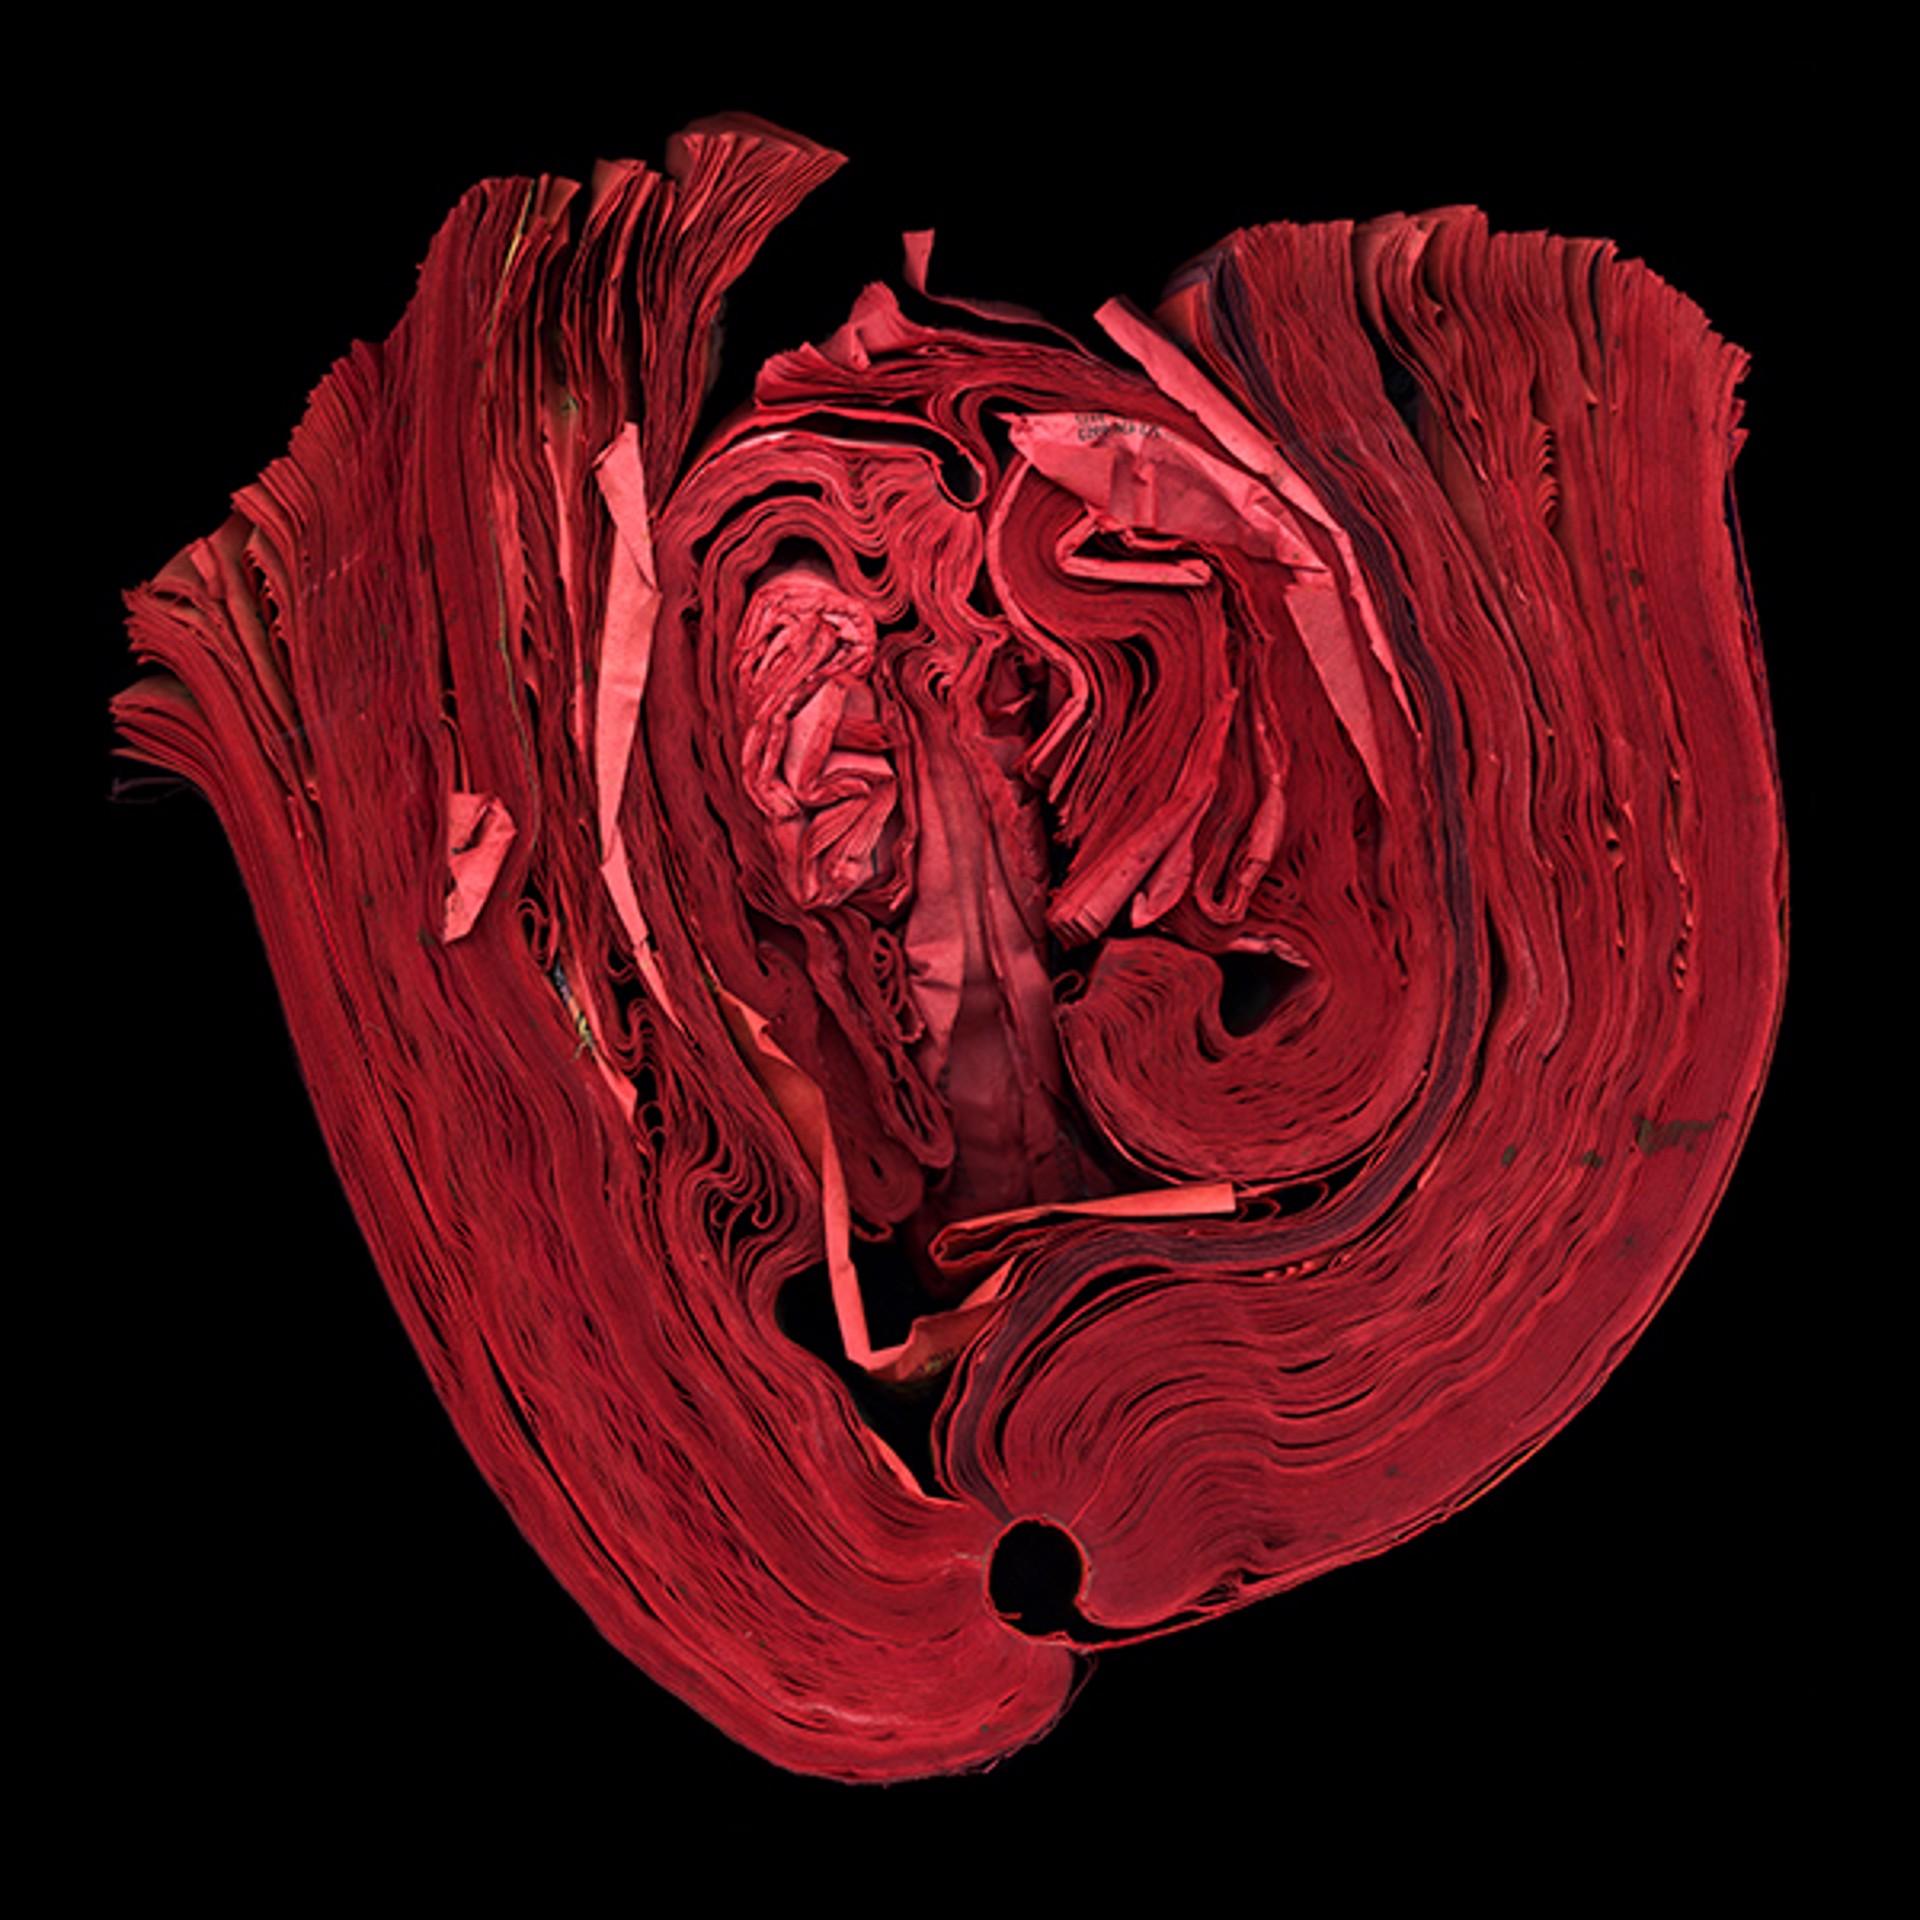 Heart by Cara Barer